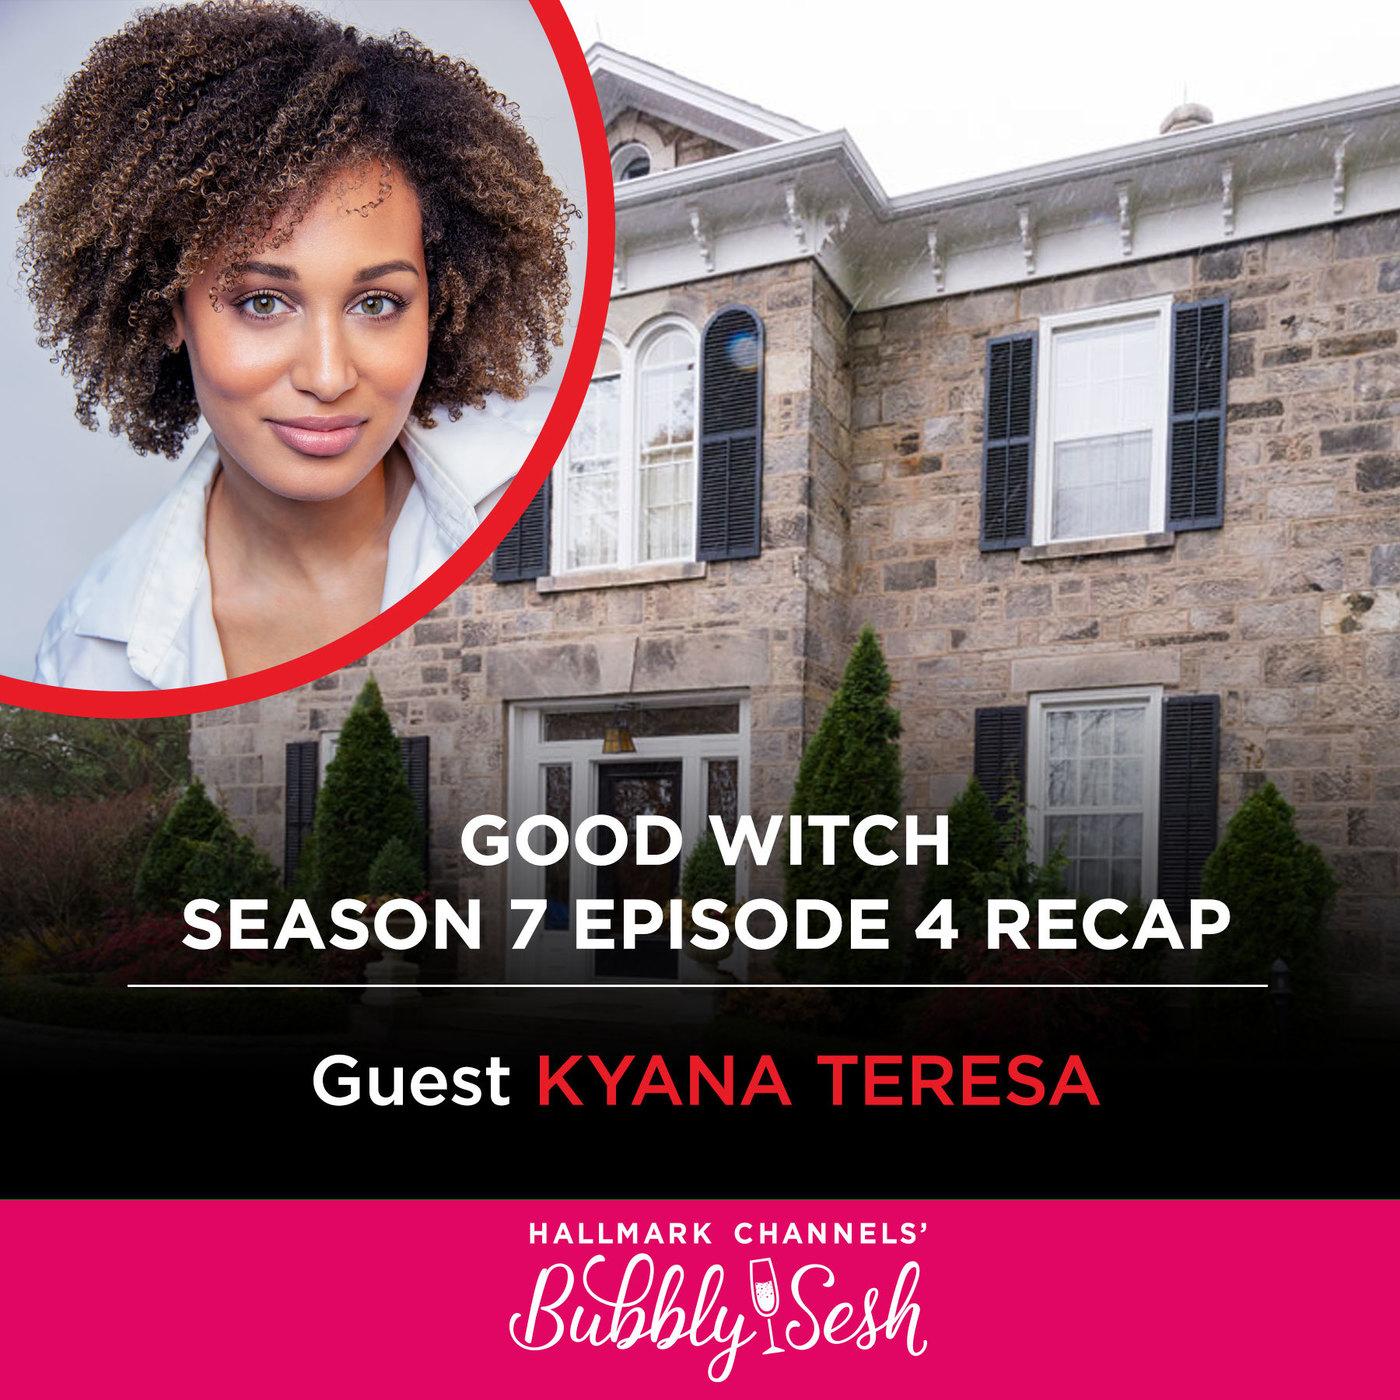 Good Witch Season 7 Episode 4 Recap with Guest Kyana Teresa